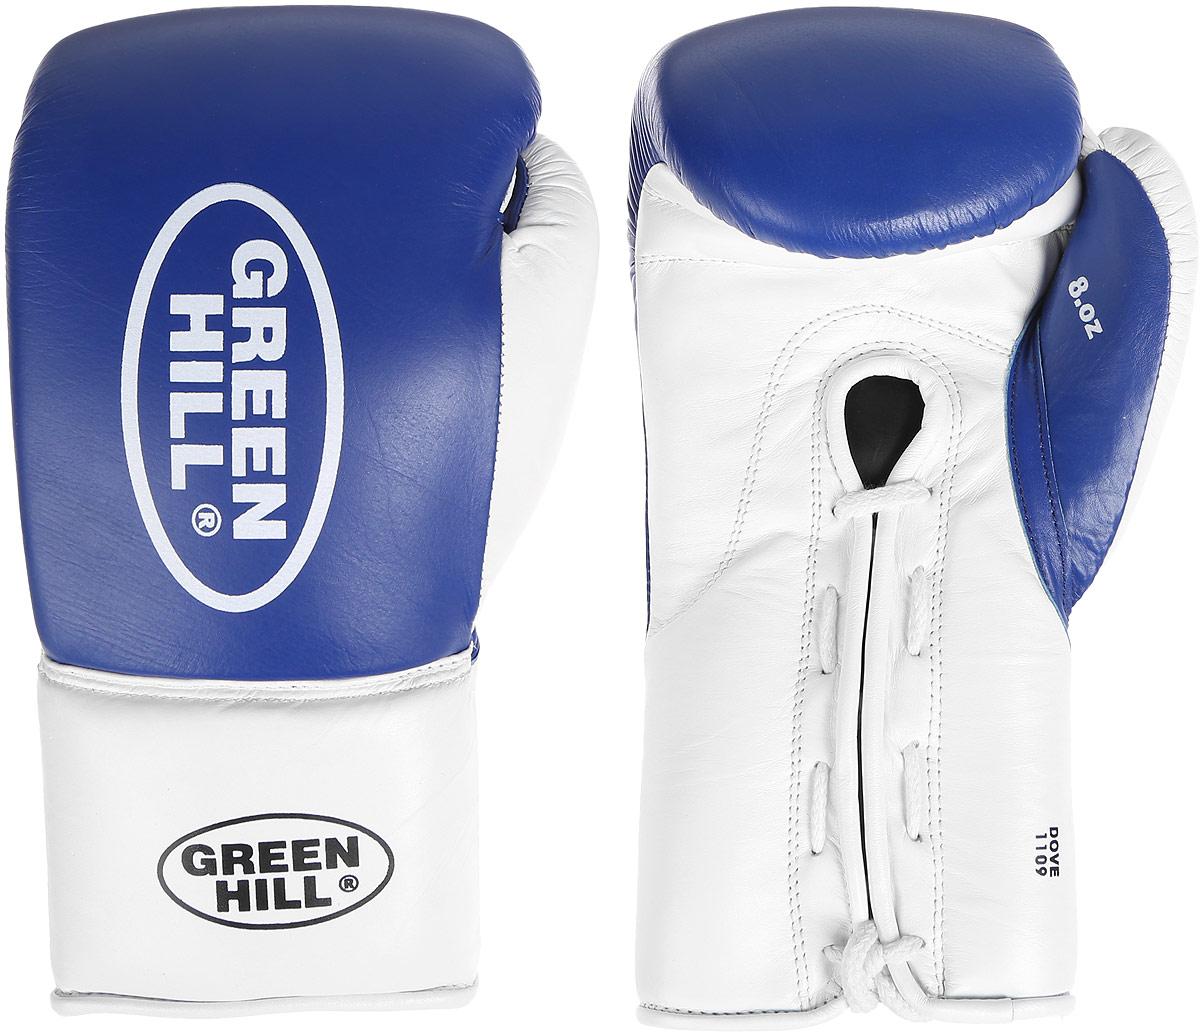 "Перчатки боксерские Green Hill ""Dove"", цвет: синий, белый. Размер 10 унций. BGD-2050"